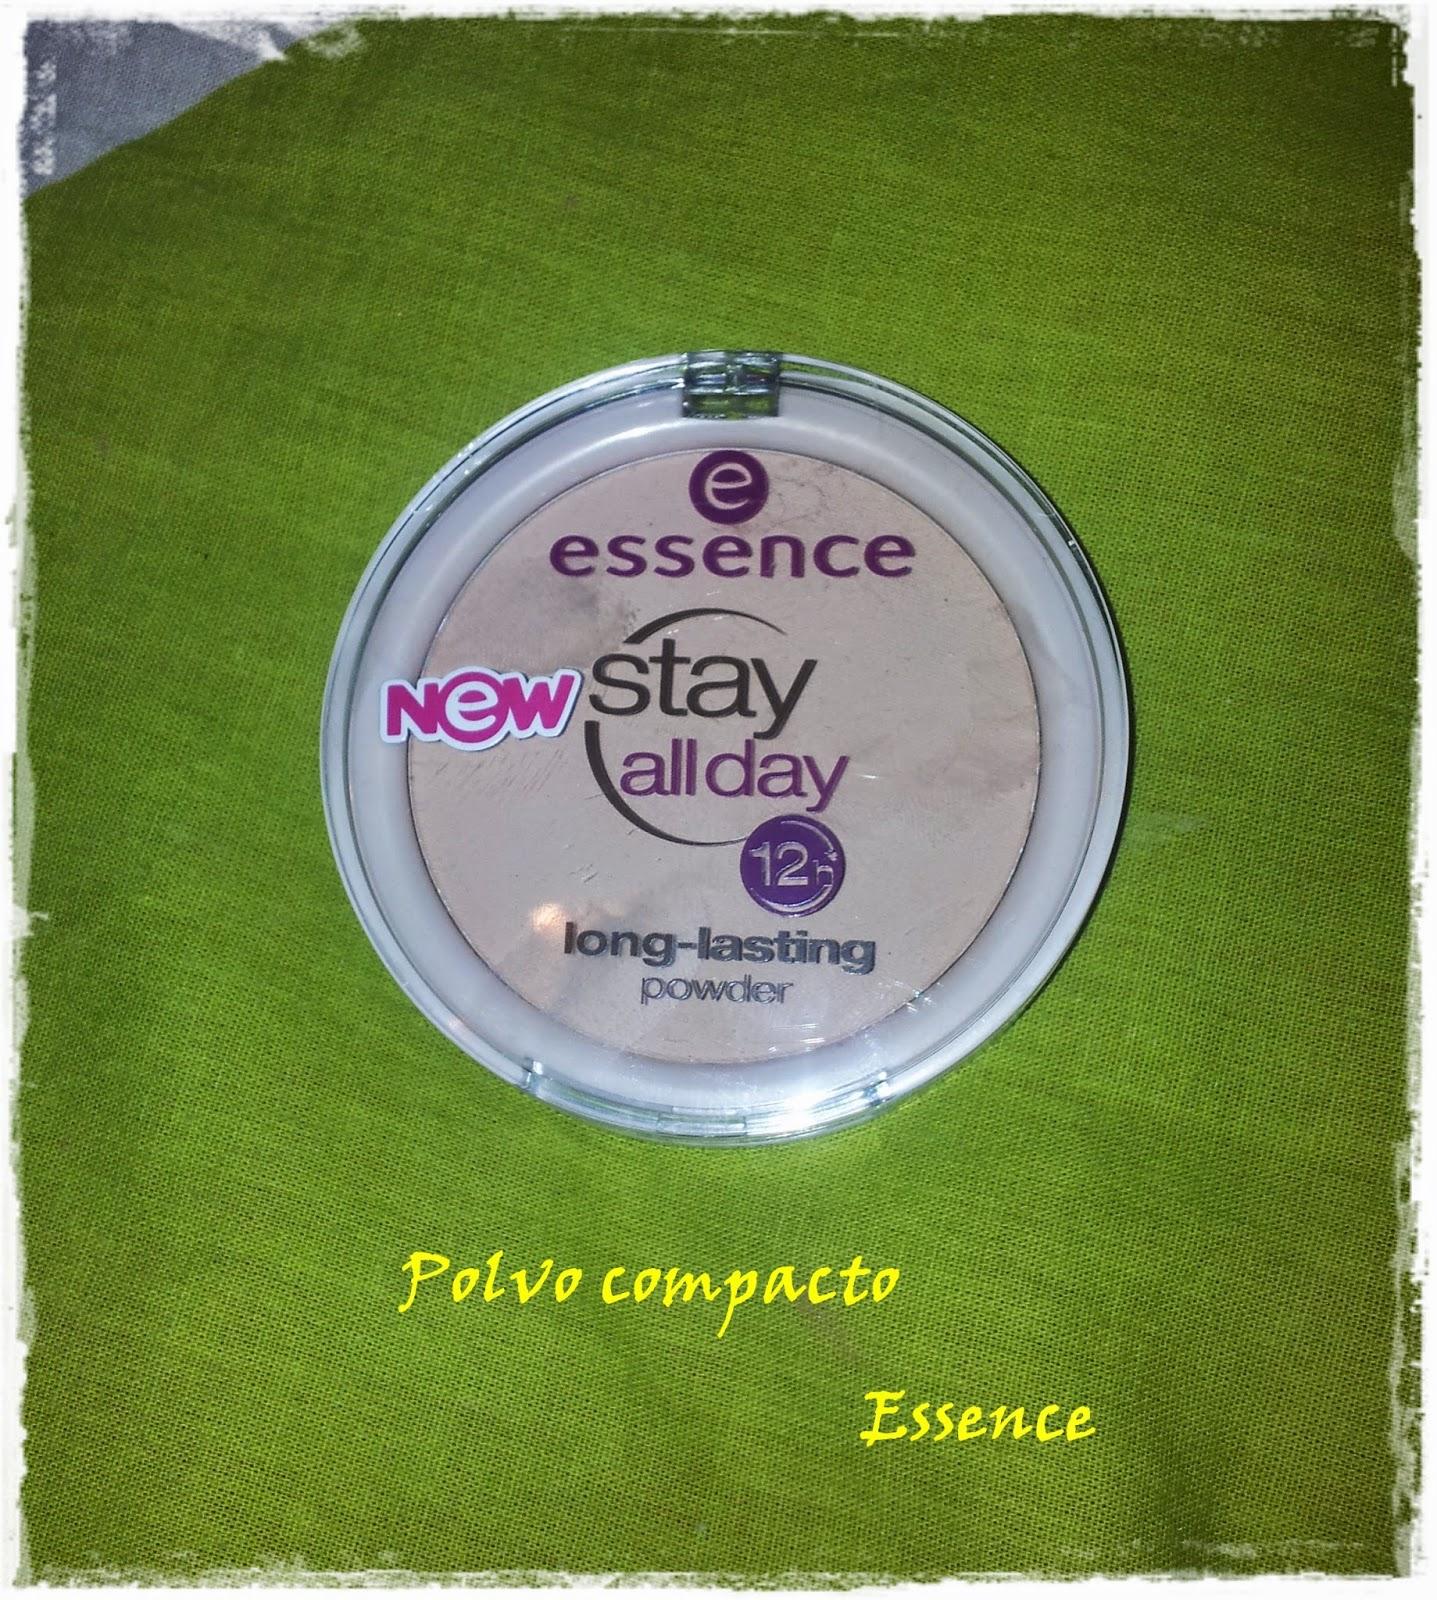 Stay all day long lasting powder de Essence